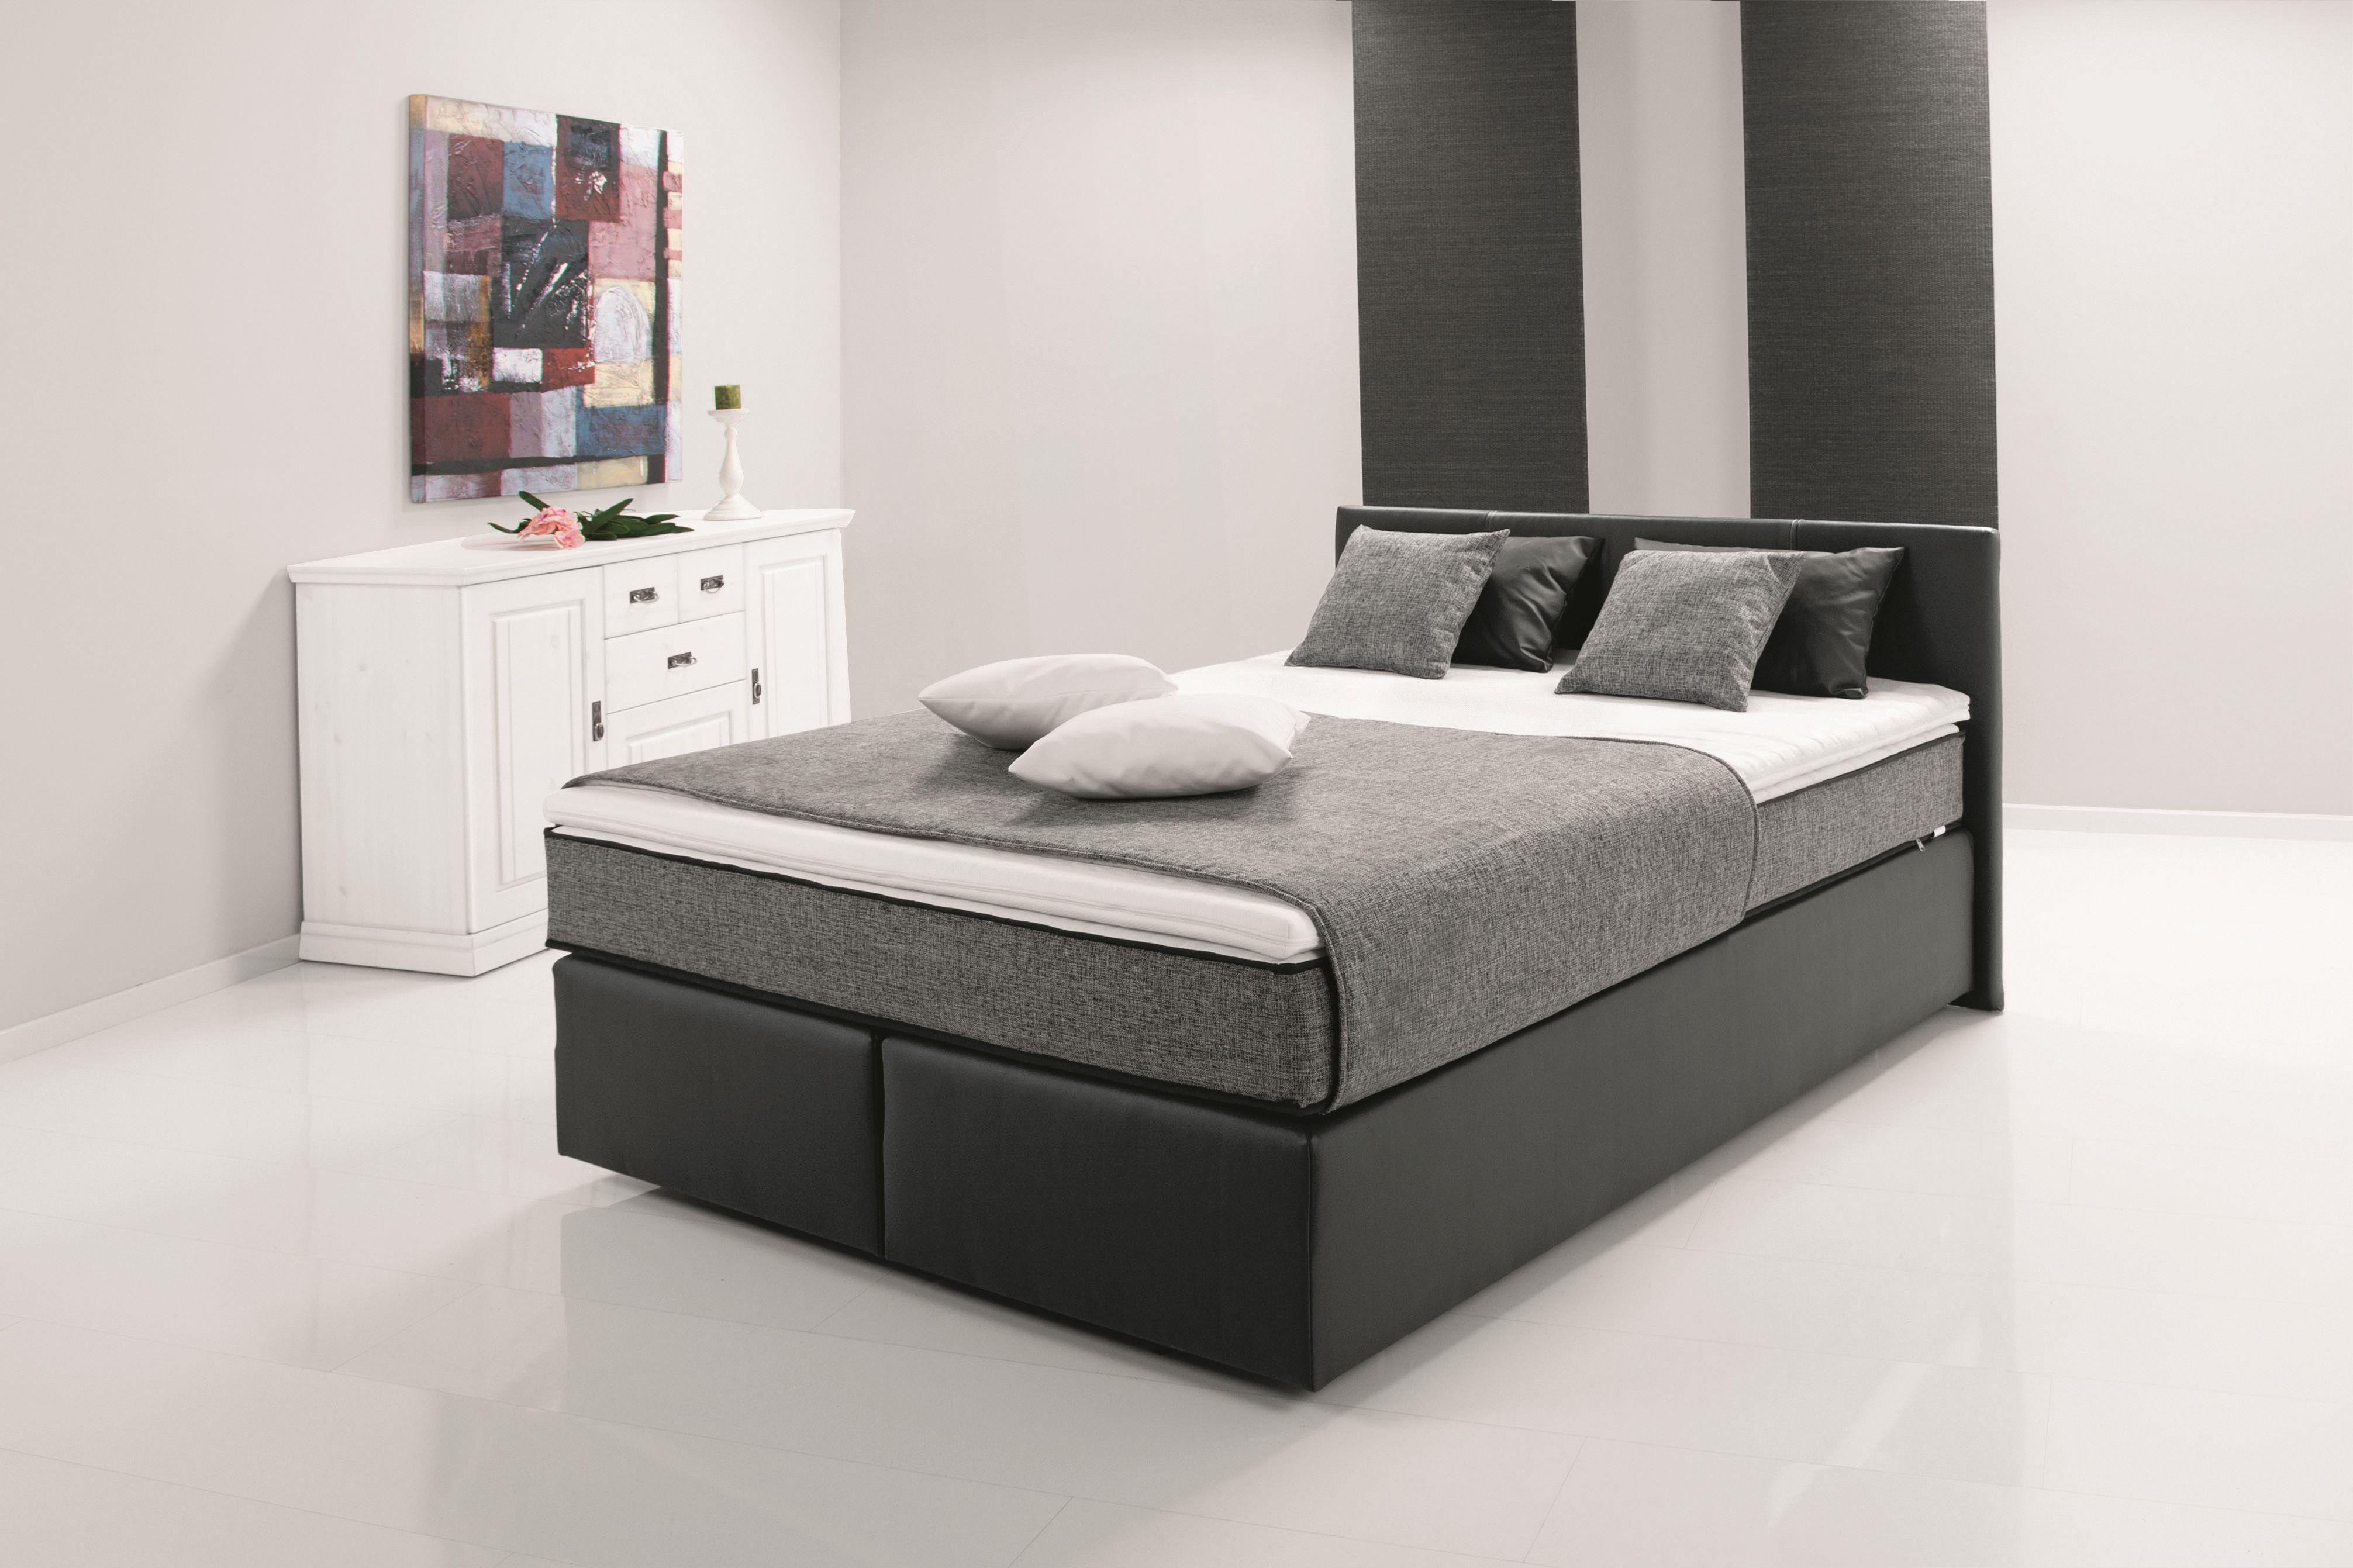 schlafzimmer bett 200x220. Black Bedroom Furniture Sets. Home Design Ideas